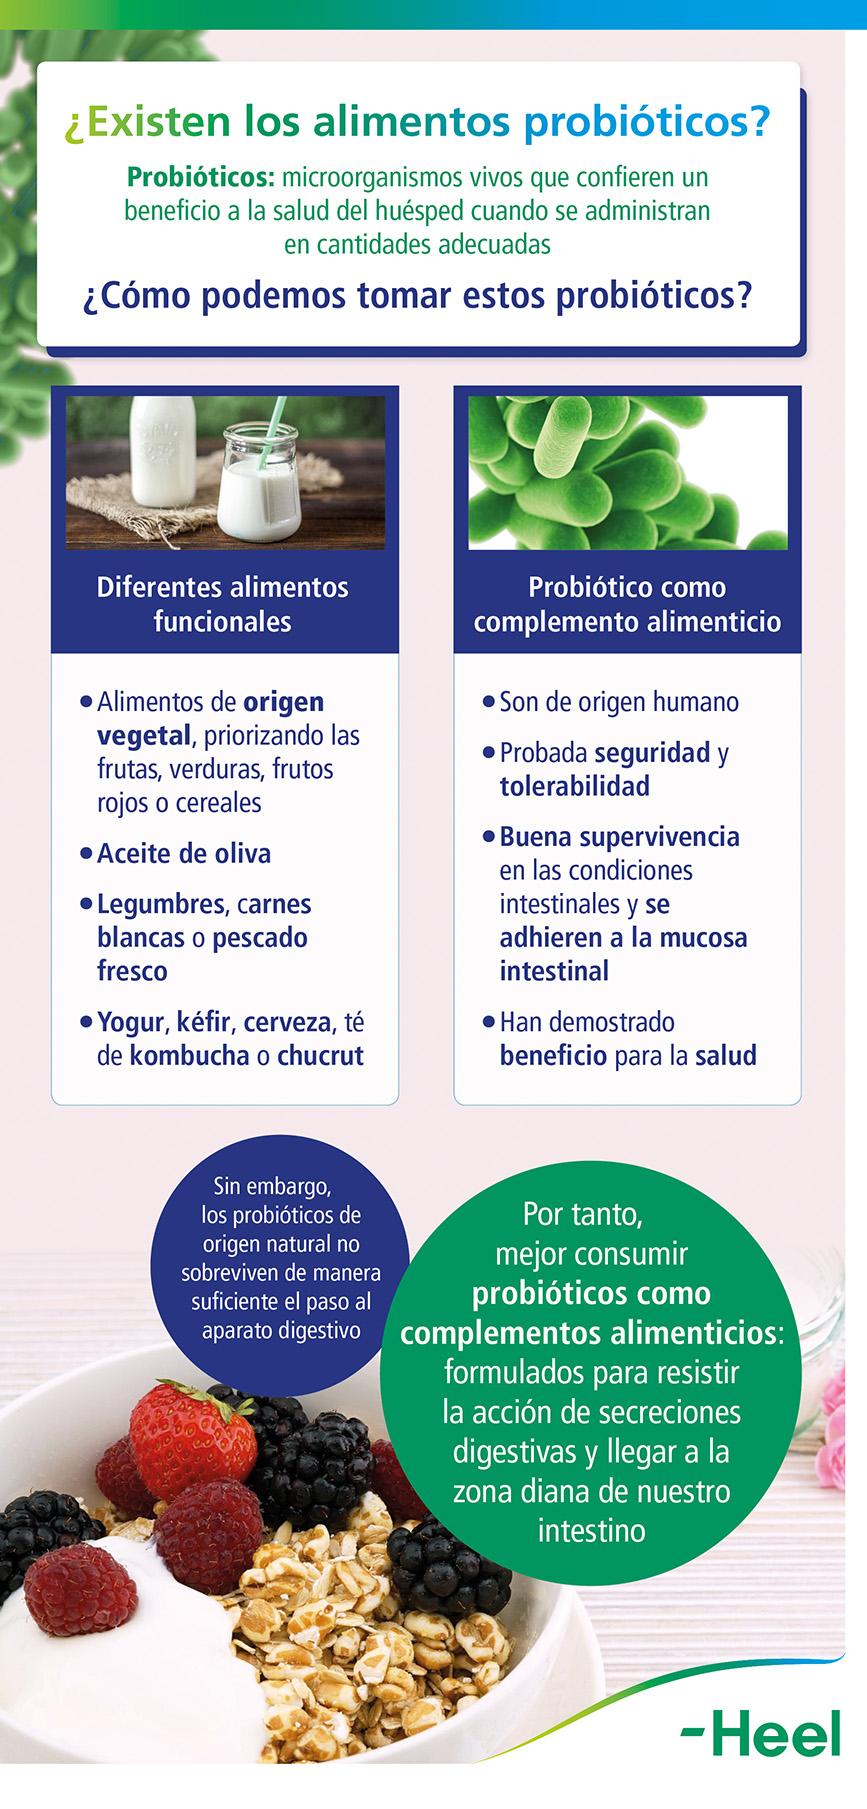 ¿Ingerimos alimentos probióticos? - HeelProbiotics - HeelEspaña